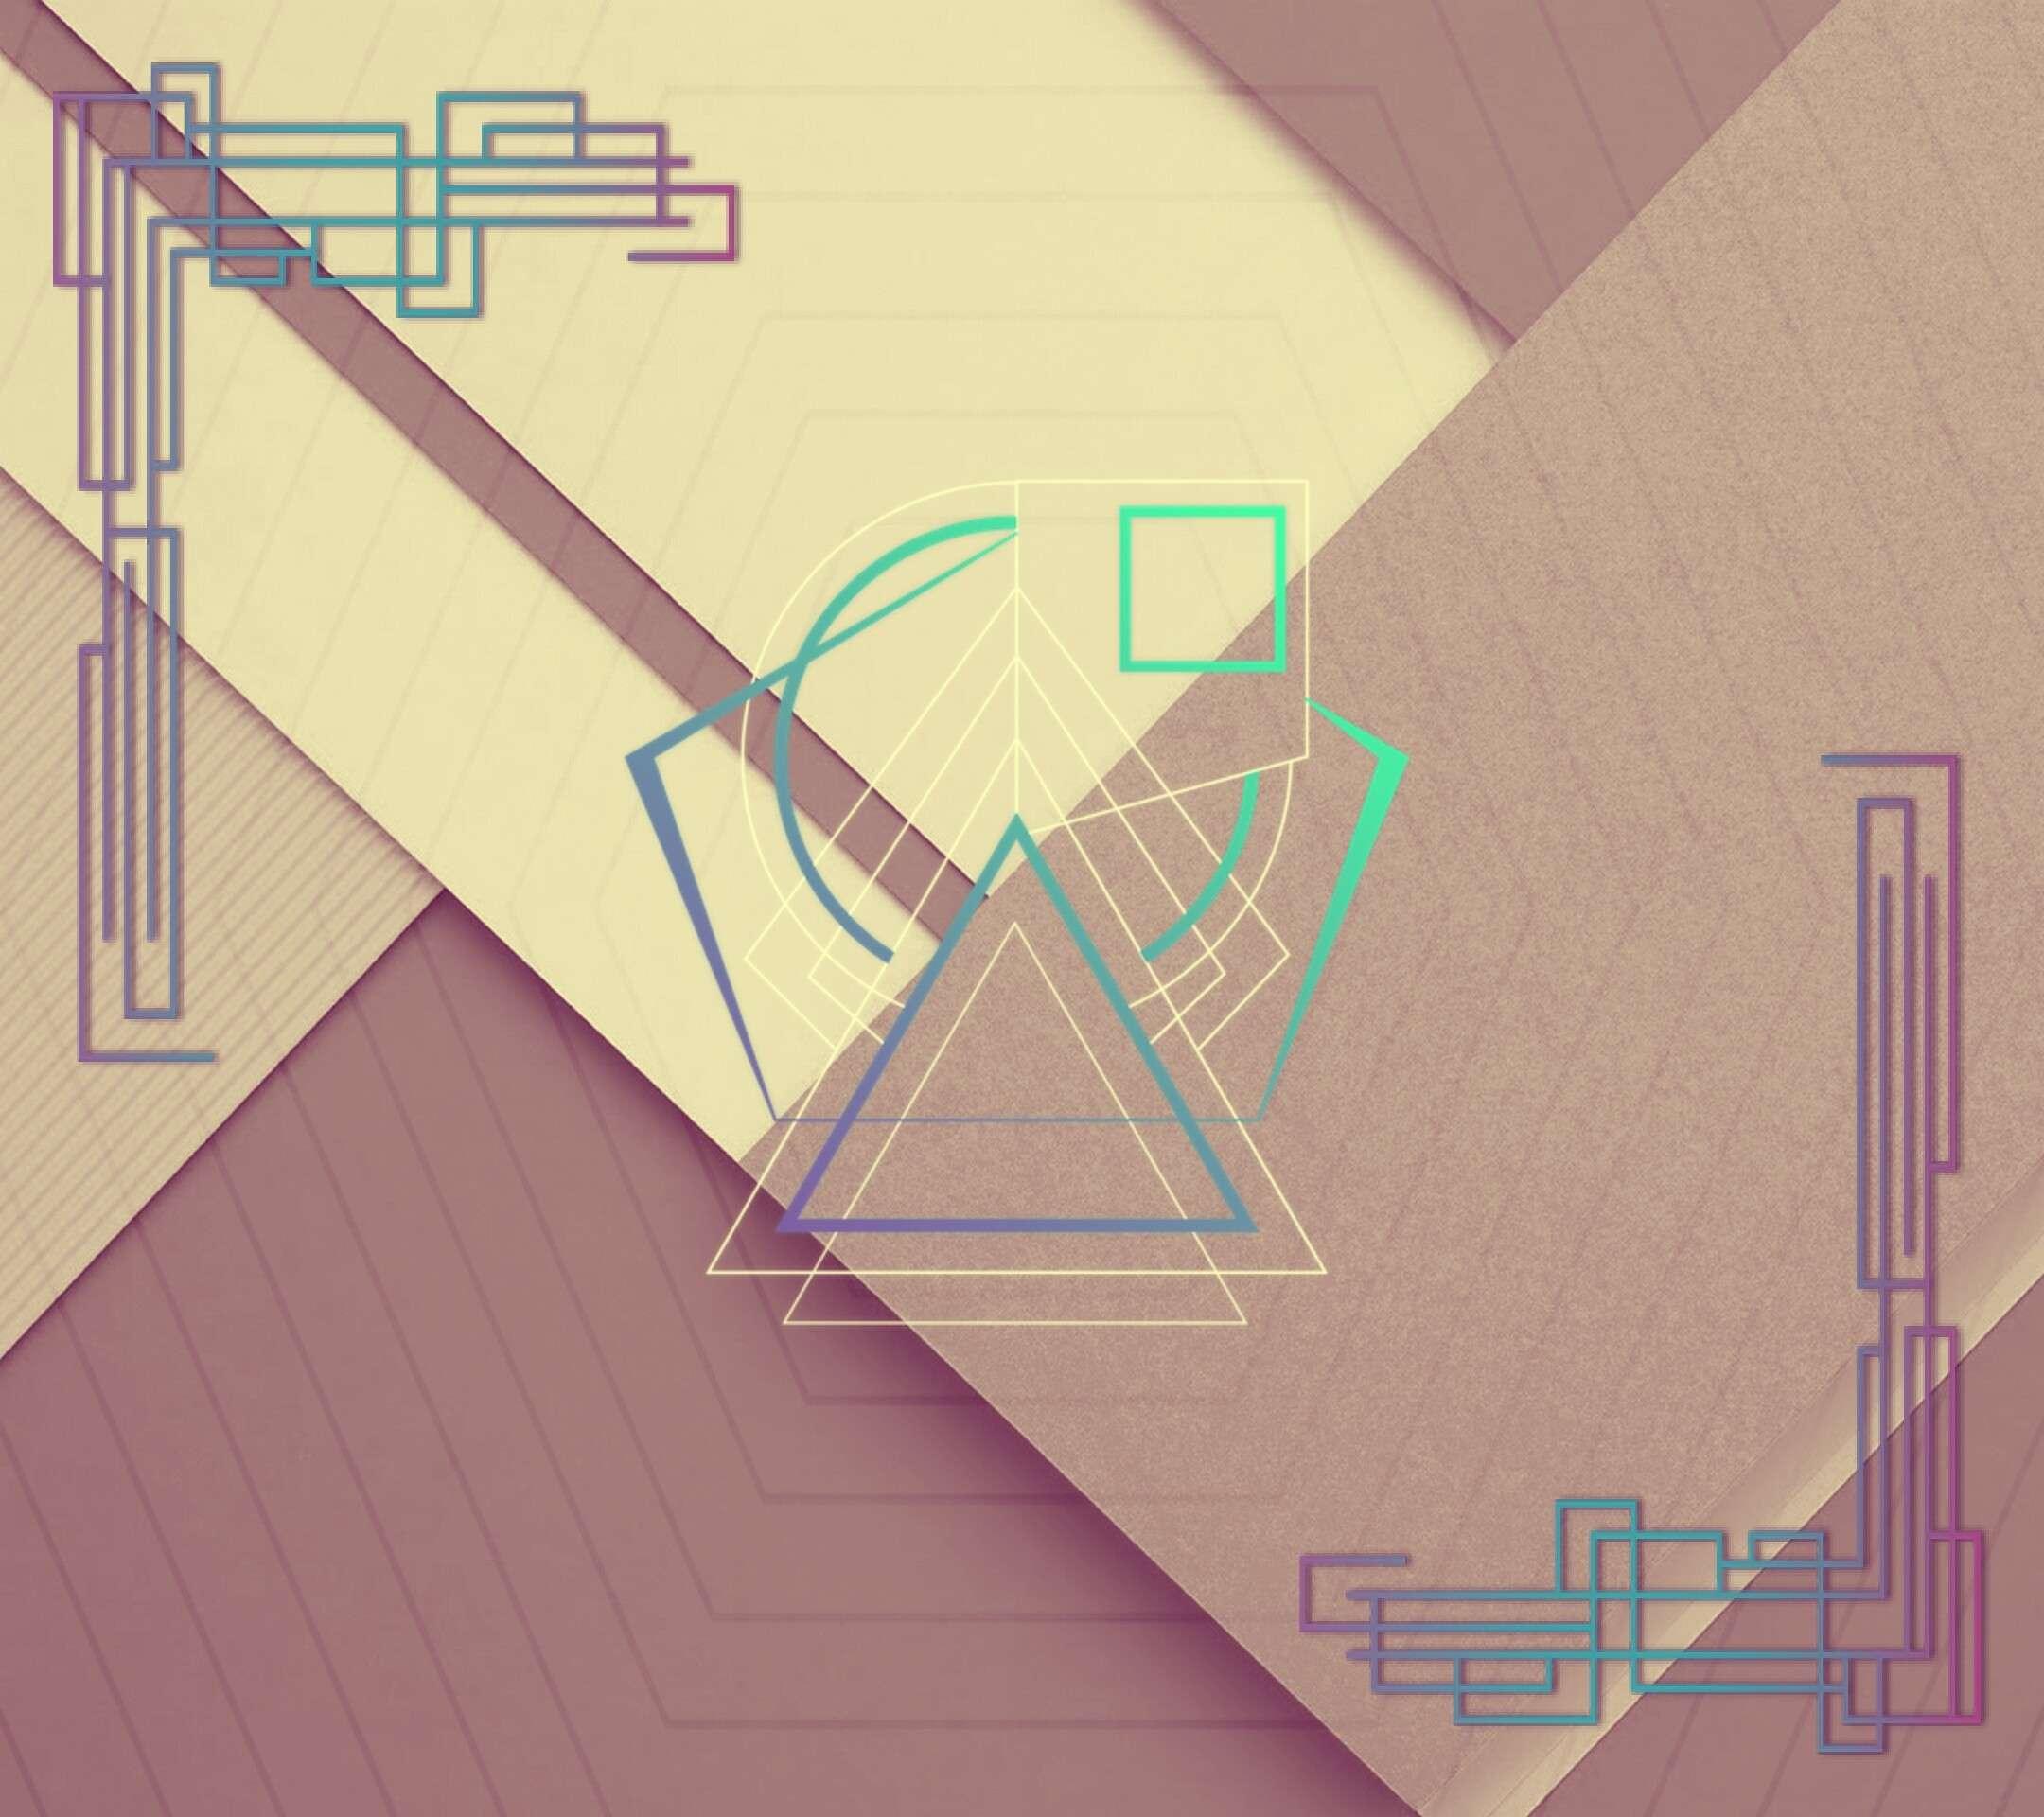 2160x1920 minimalism material style pattern